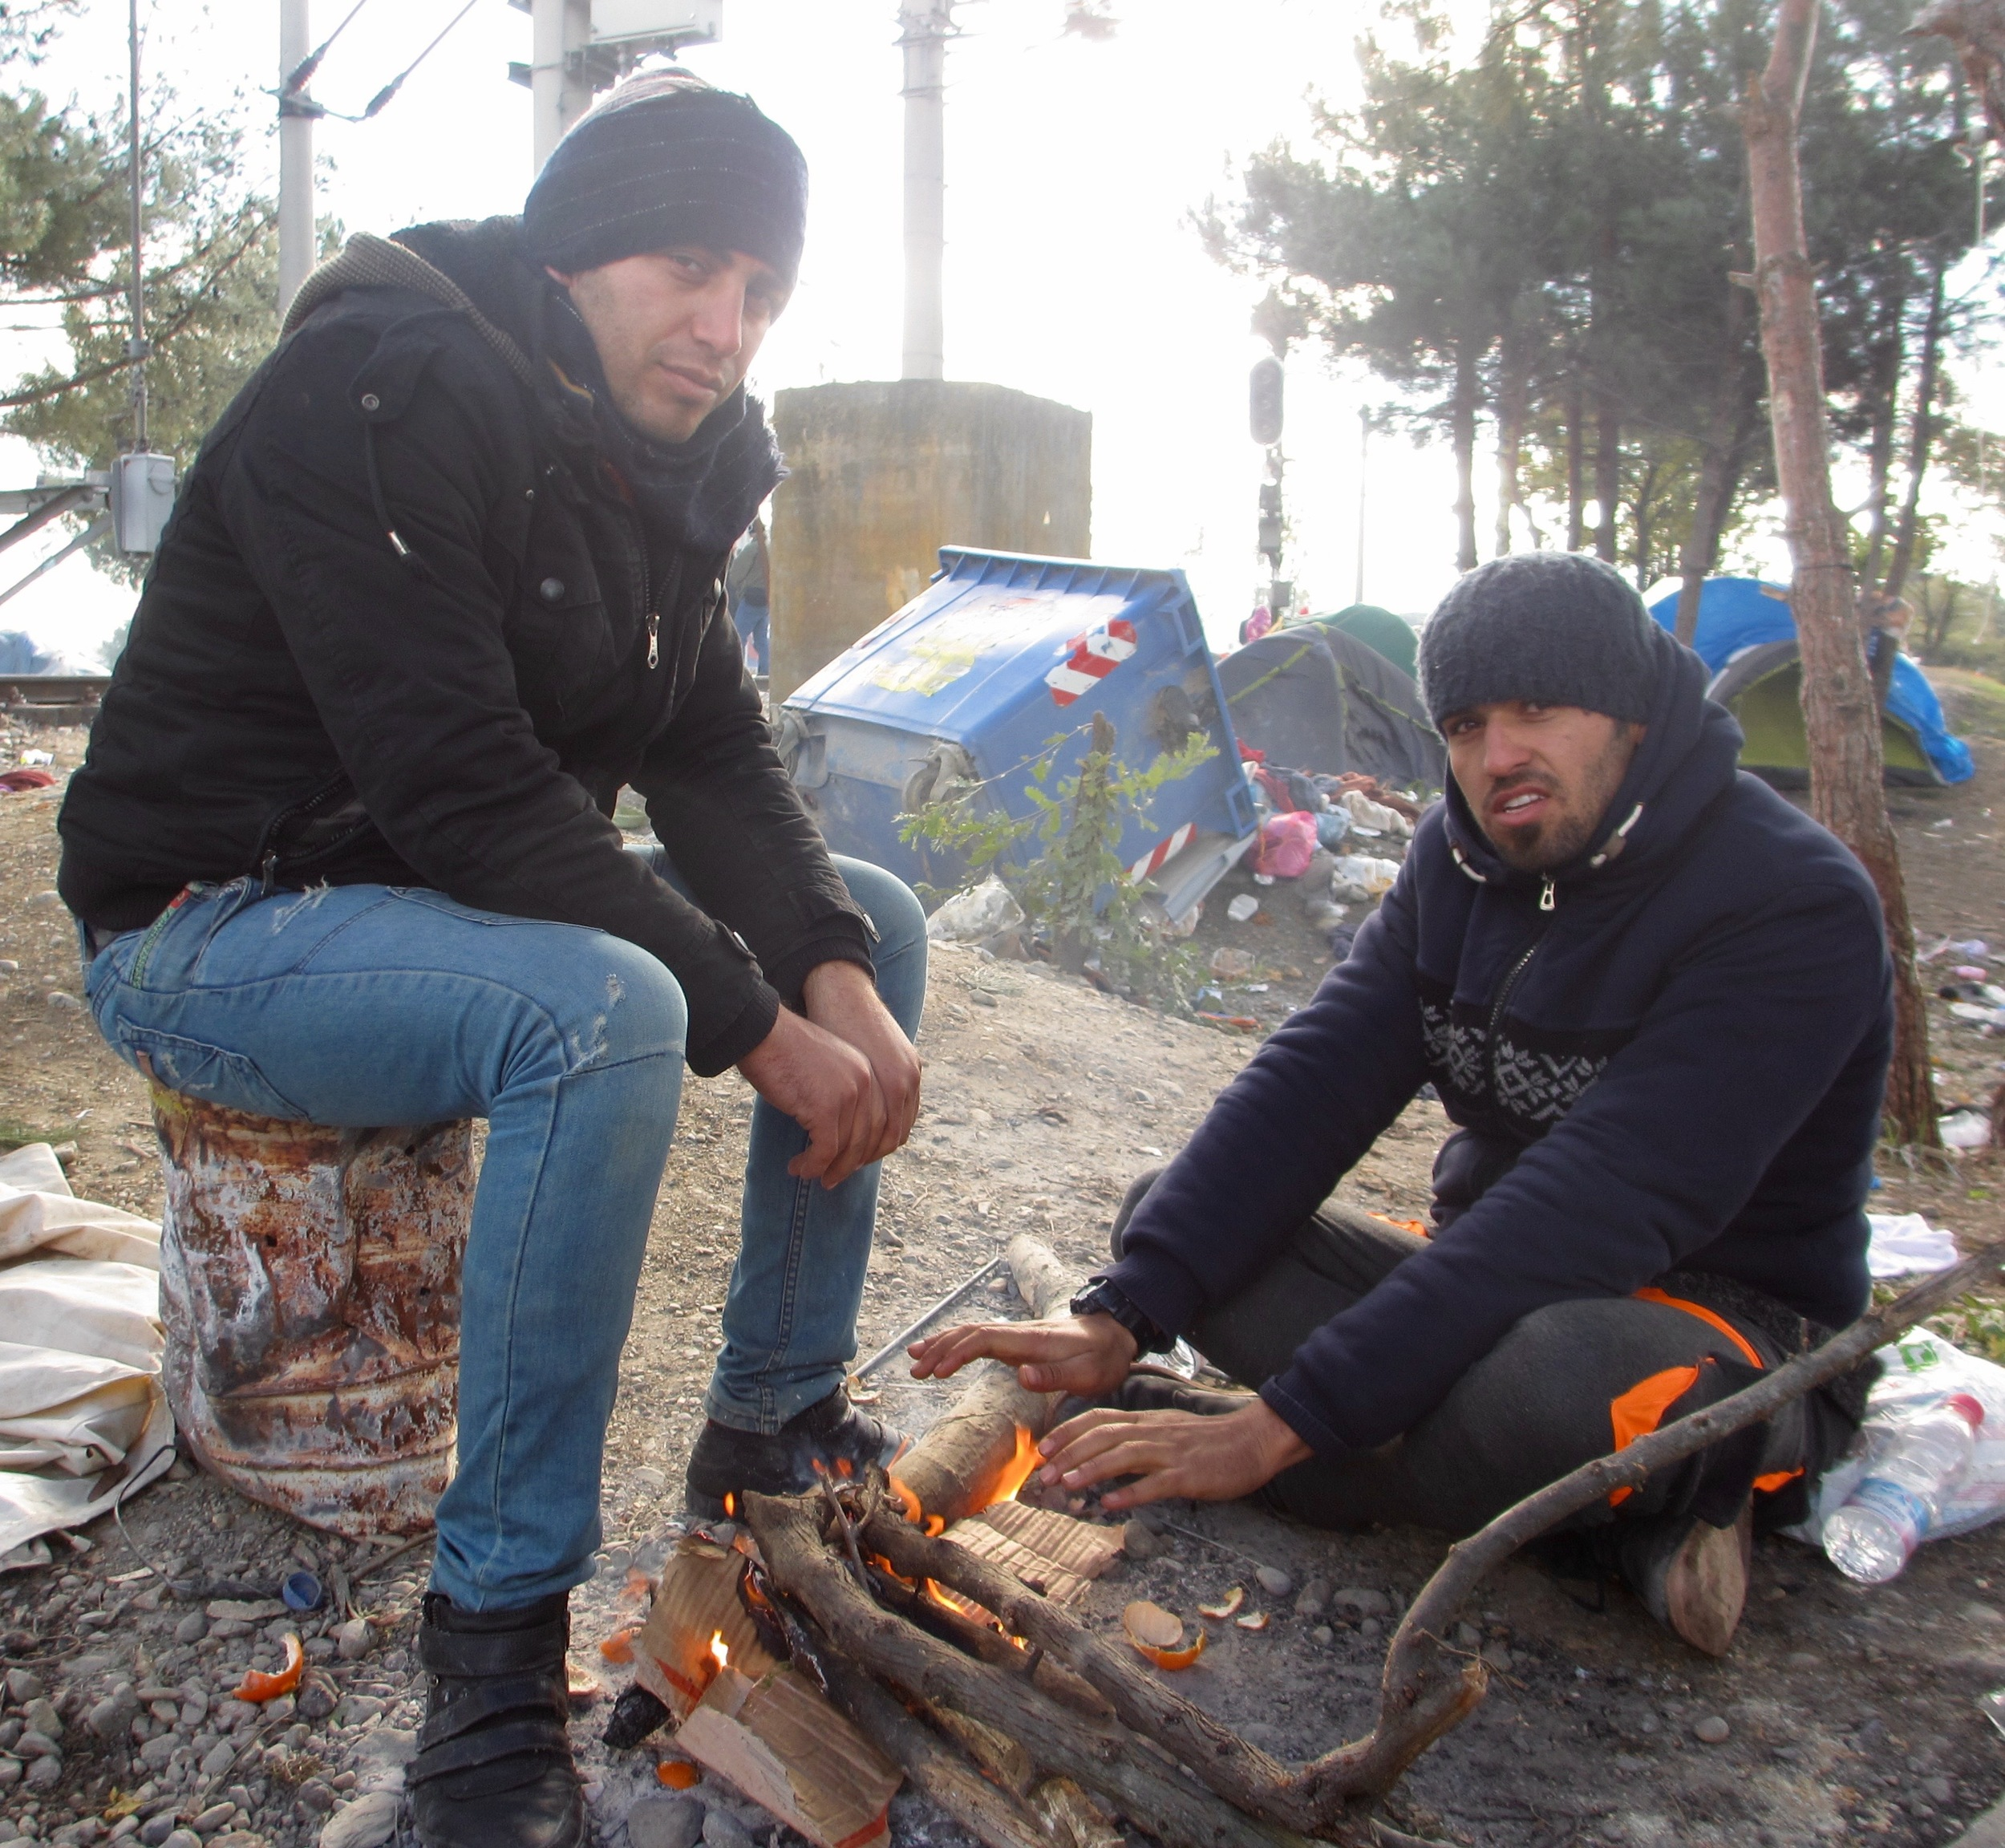 Two Iranian men make a fire at Idomeni transit camp on Greece's northern border with Macedonia.